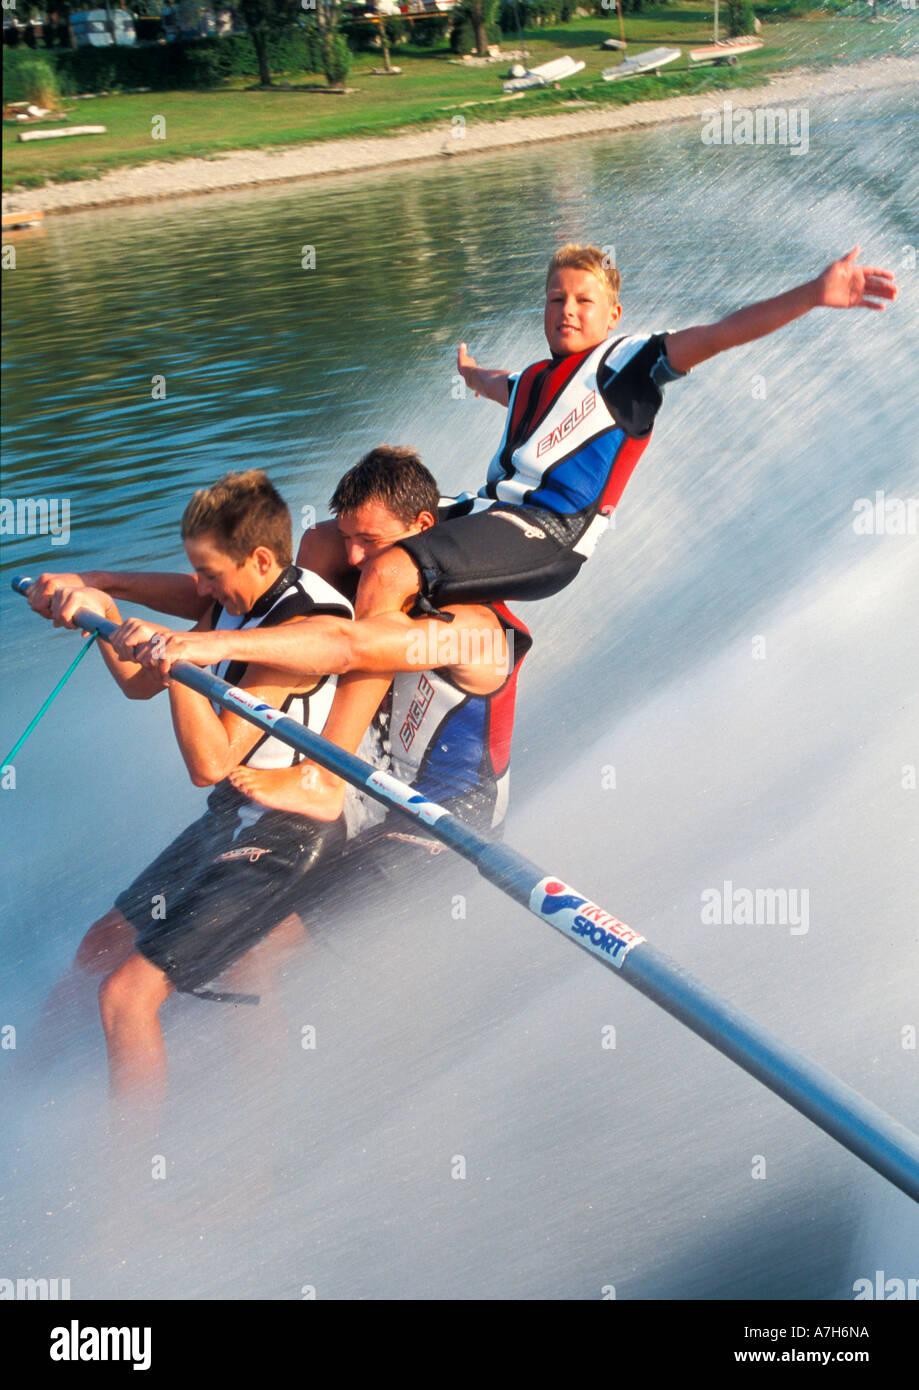 waterski - Stock Image